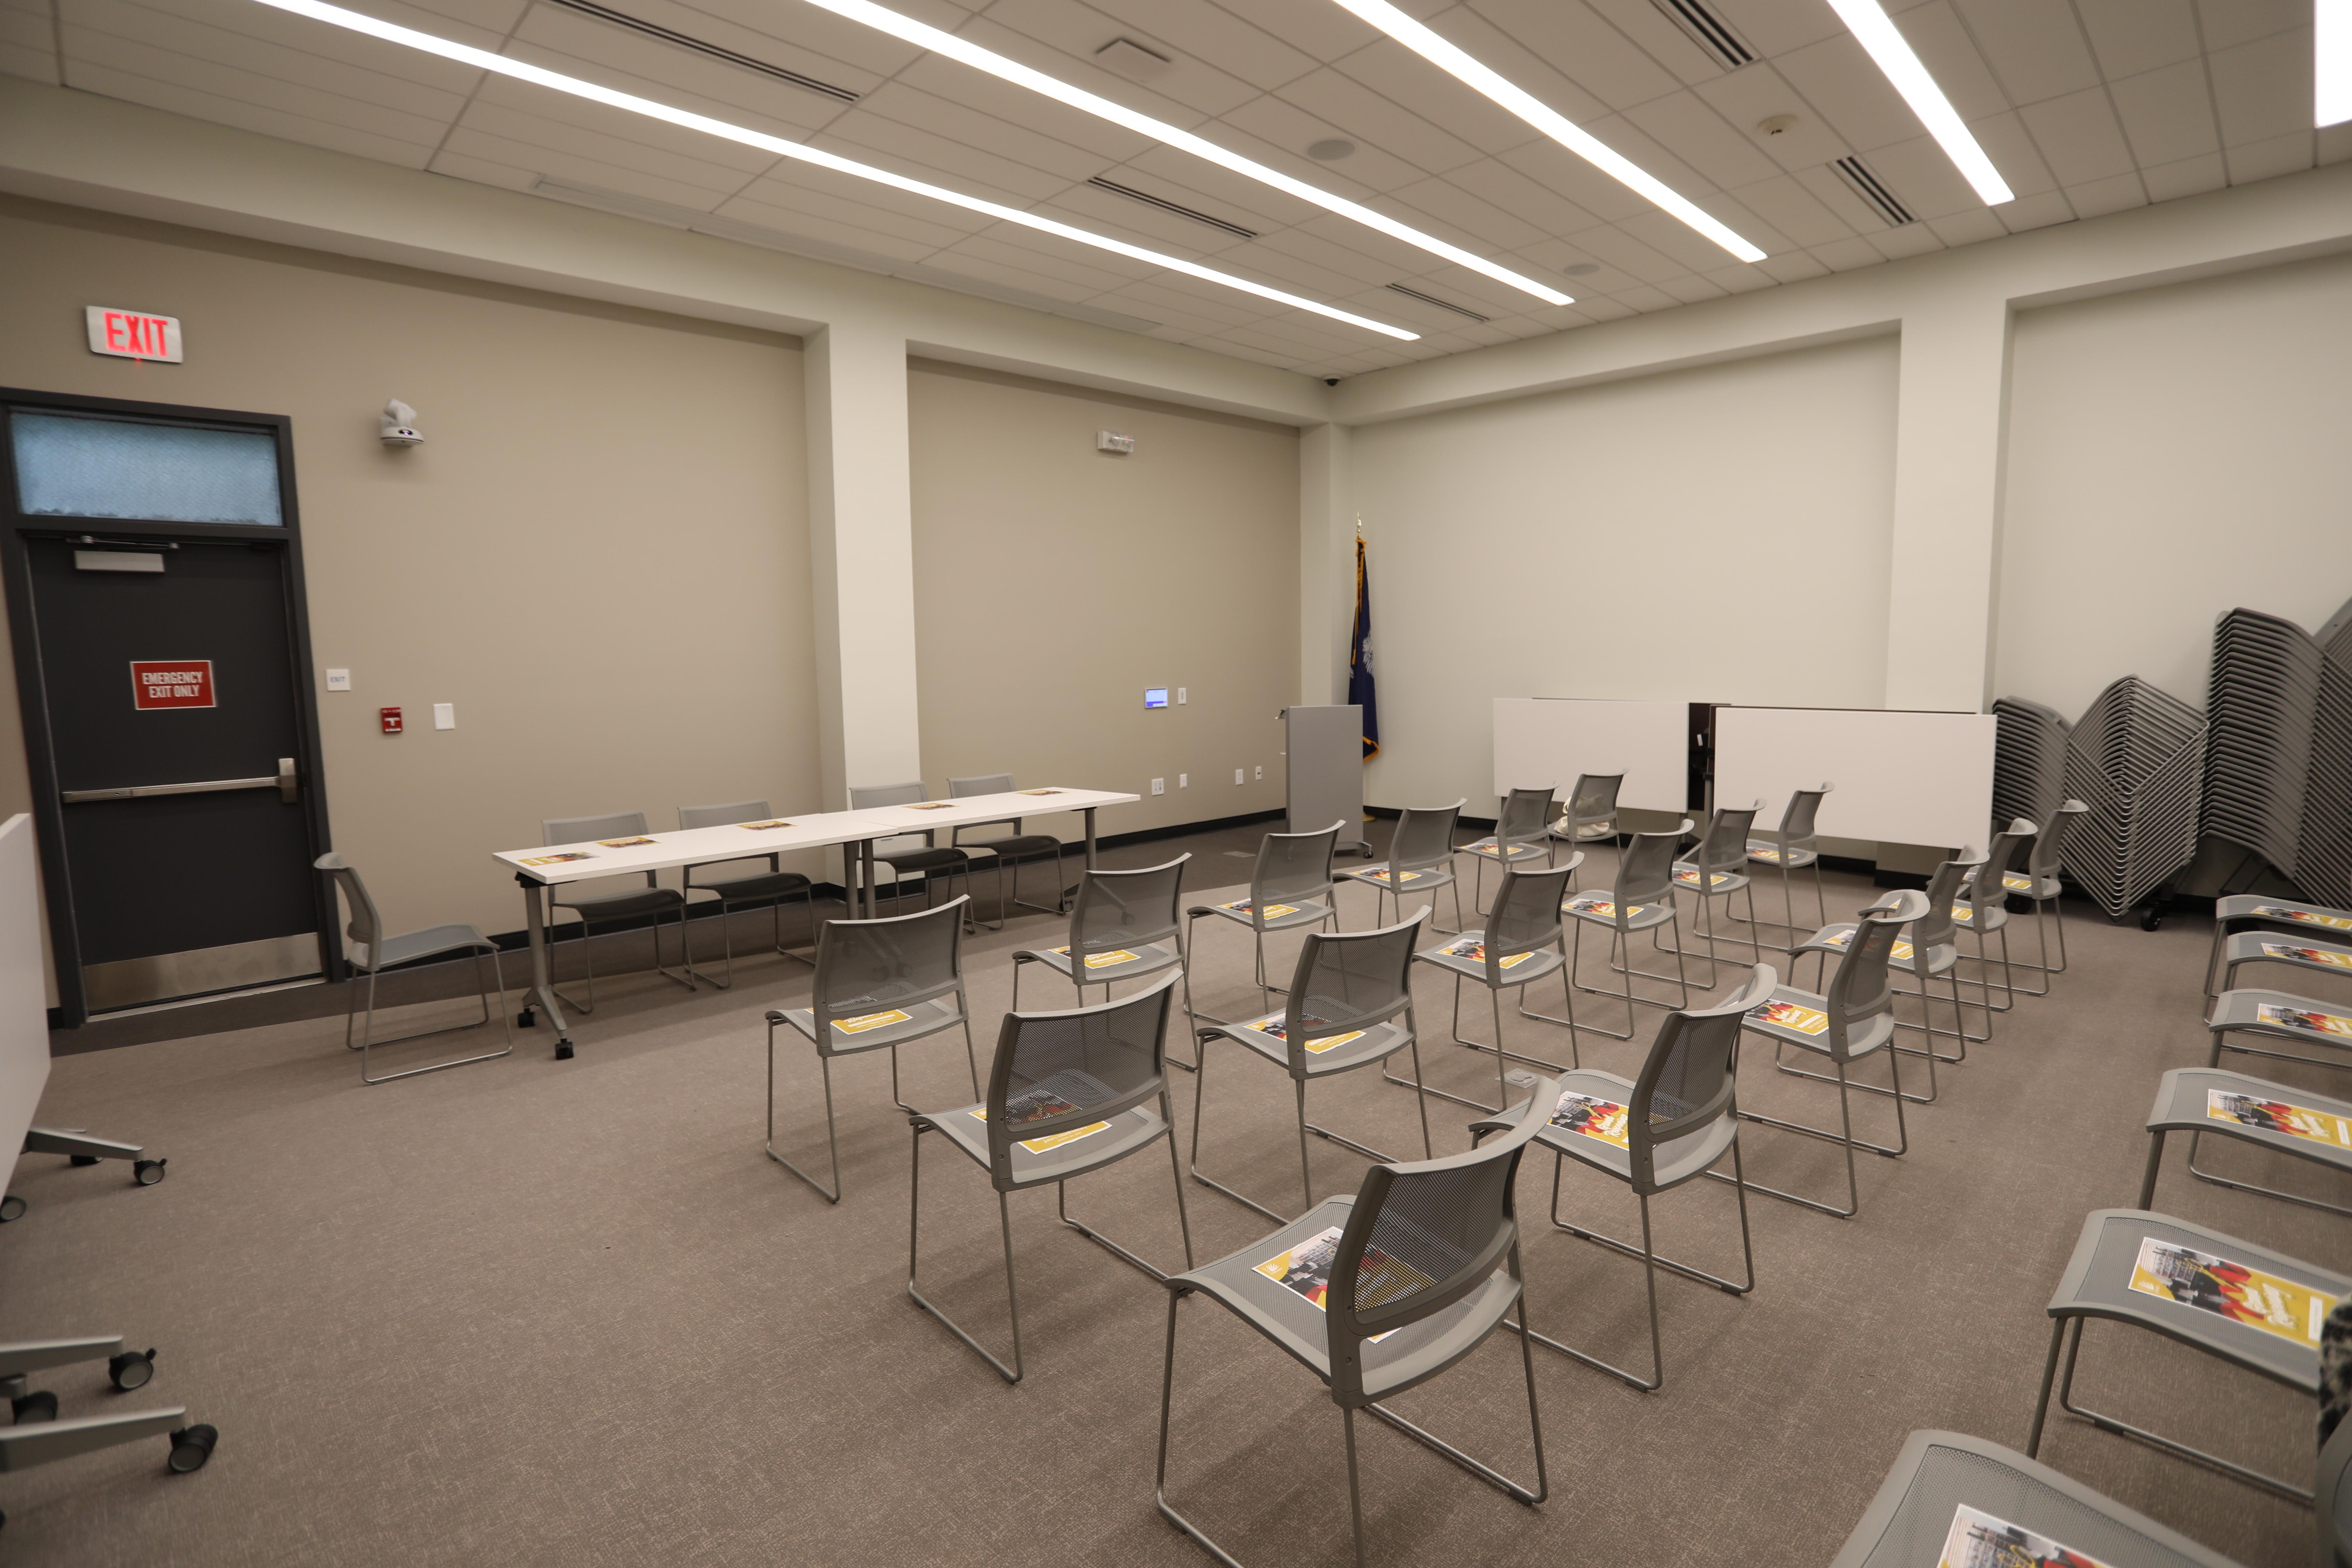 Large Room - Capacity: 55, projector, screen, audio/video equipment